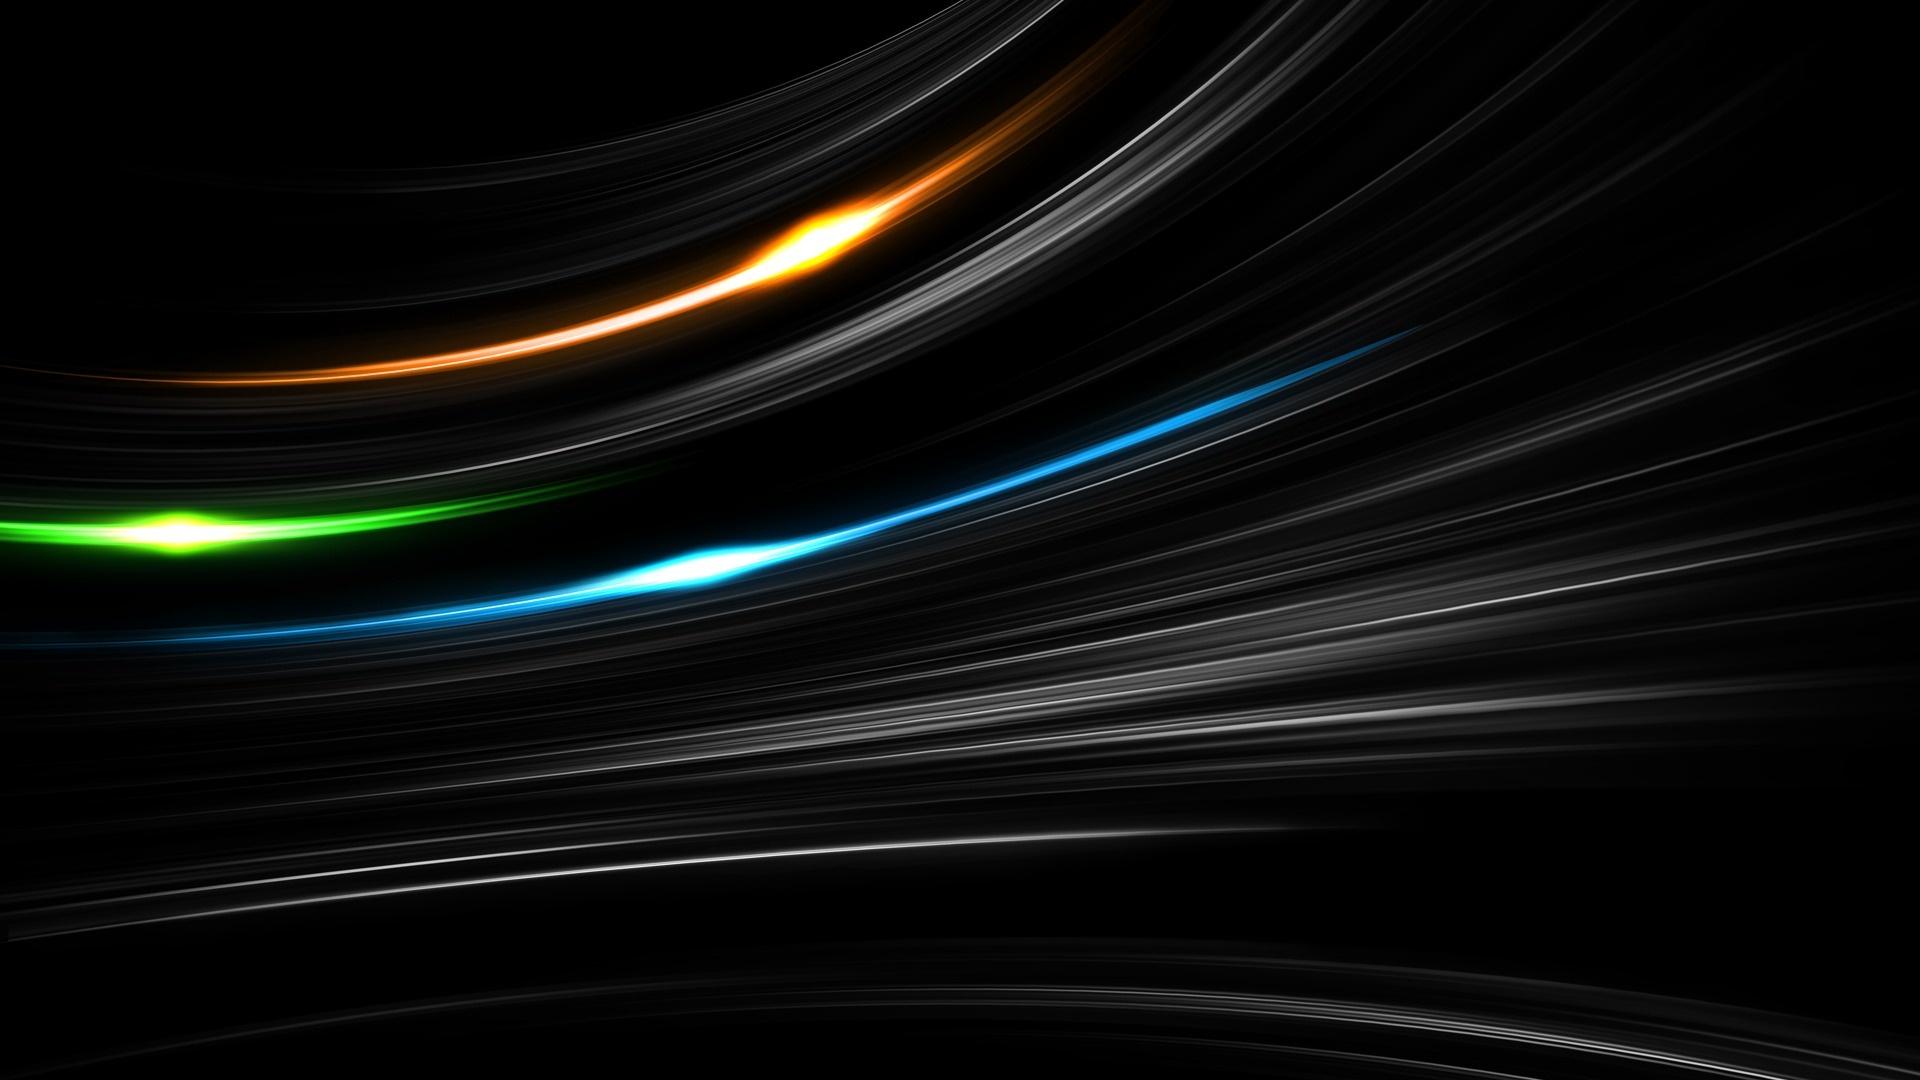 Light Blaze HD 1080p Wallpapers HD Wallpapers 1920x1080